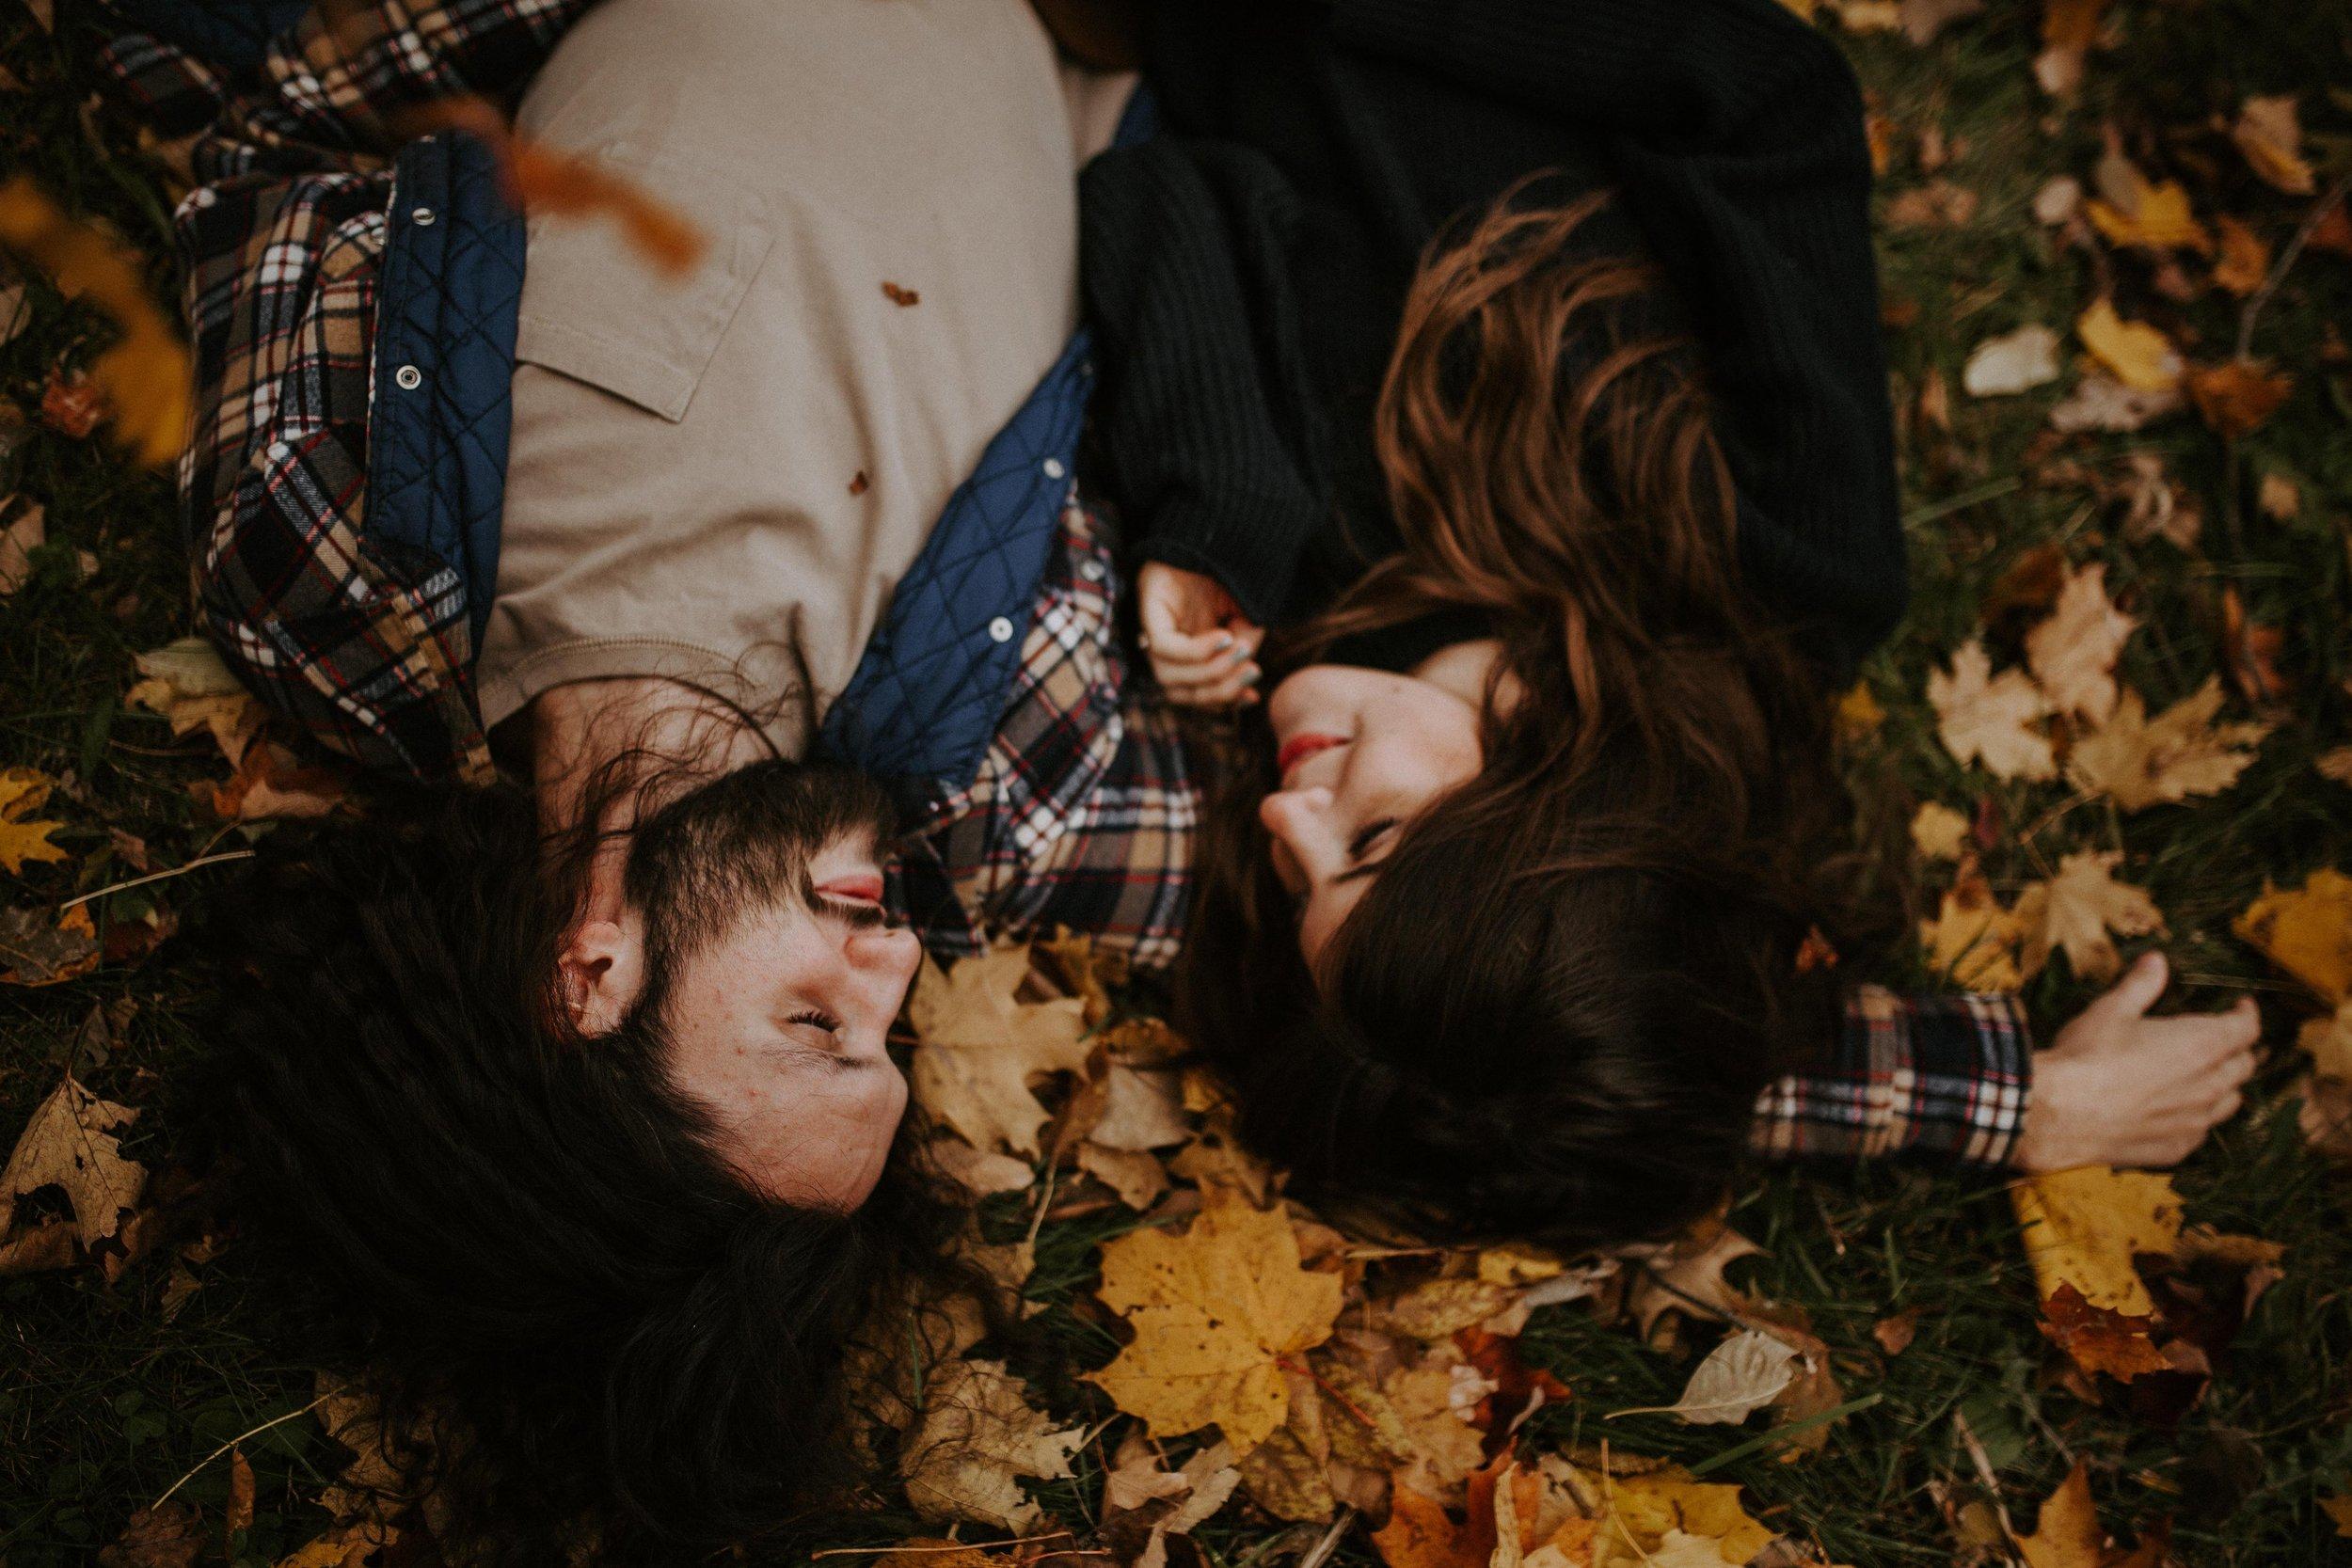 reaganlynnphotography-couplephotography-connerprairie-leximccracken20.jpg